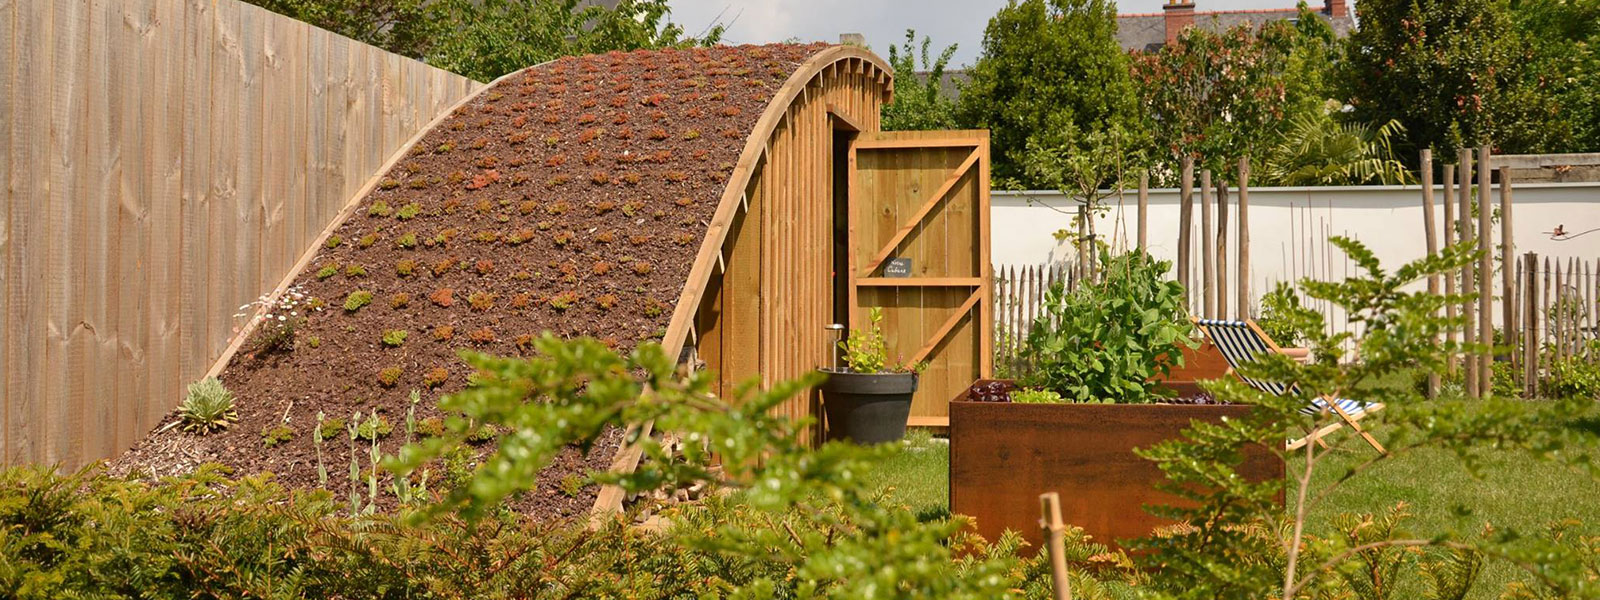 charmant creer un jardin anglais with crer un jardin anglais. Black Bedroom Furniture Sets. Home Design Ideas